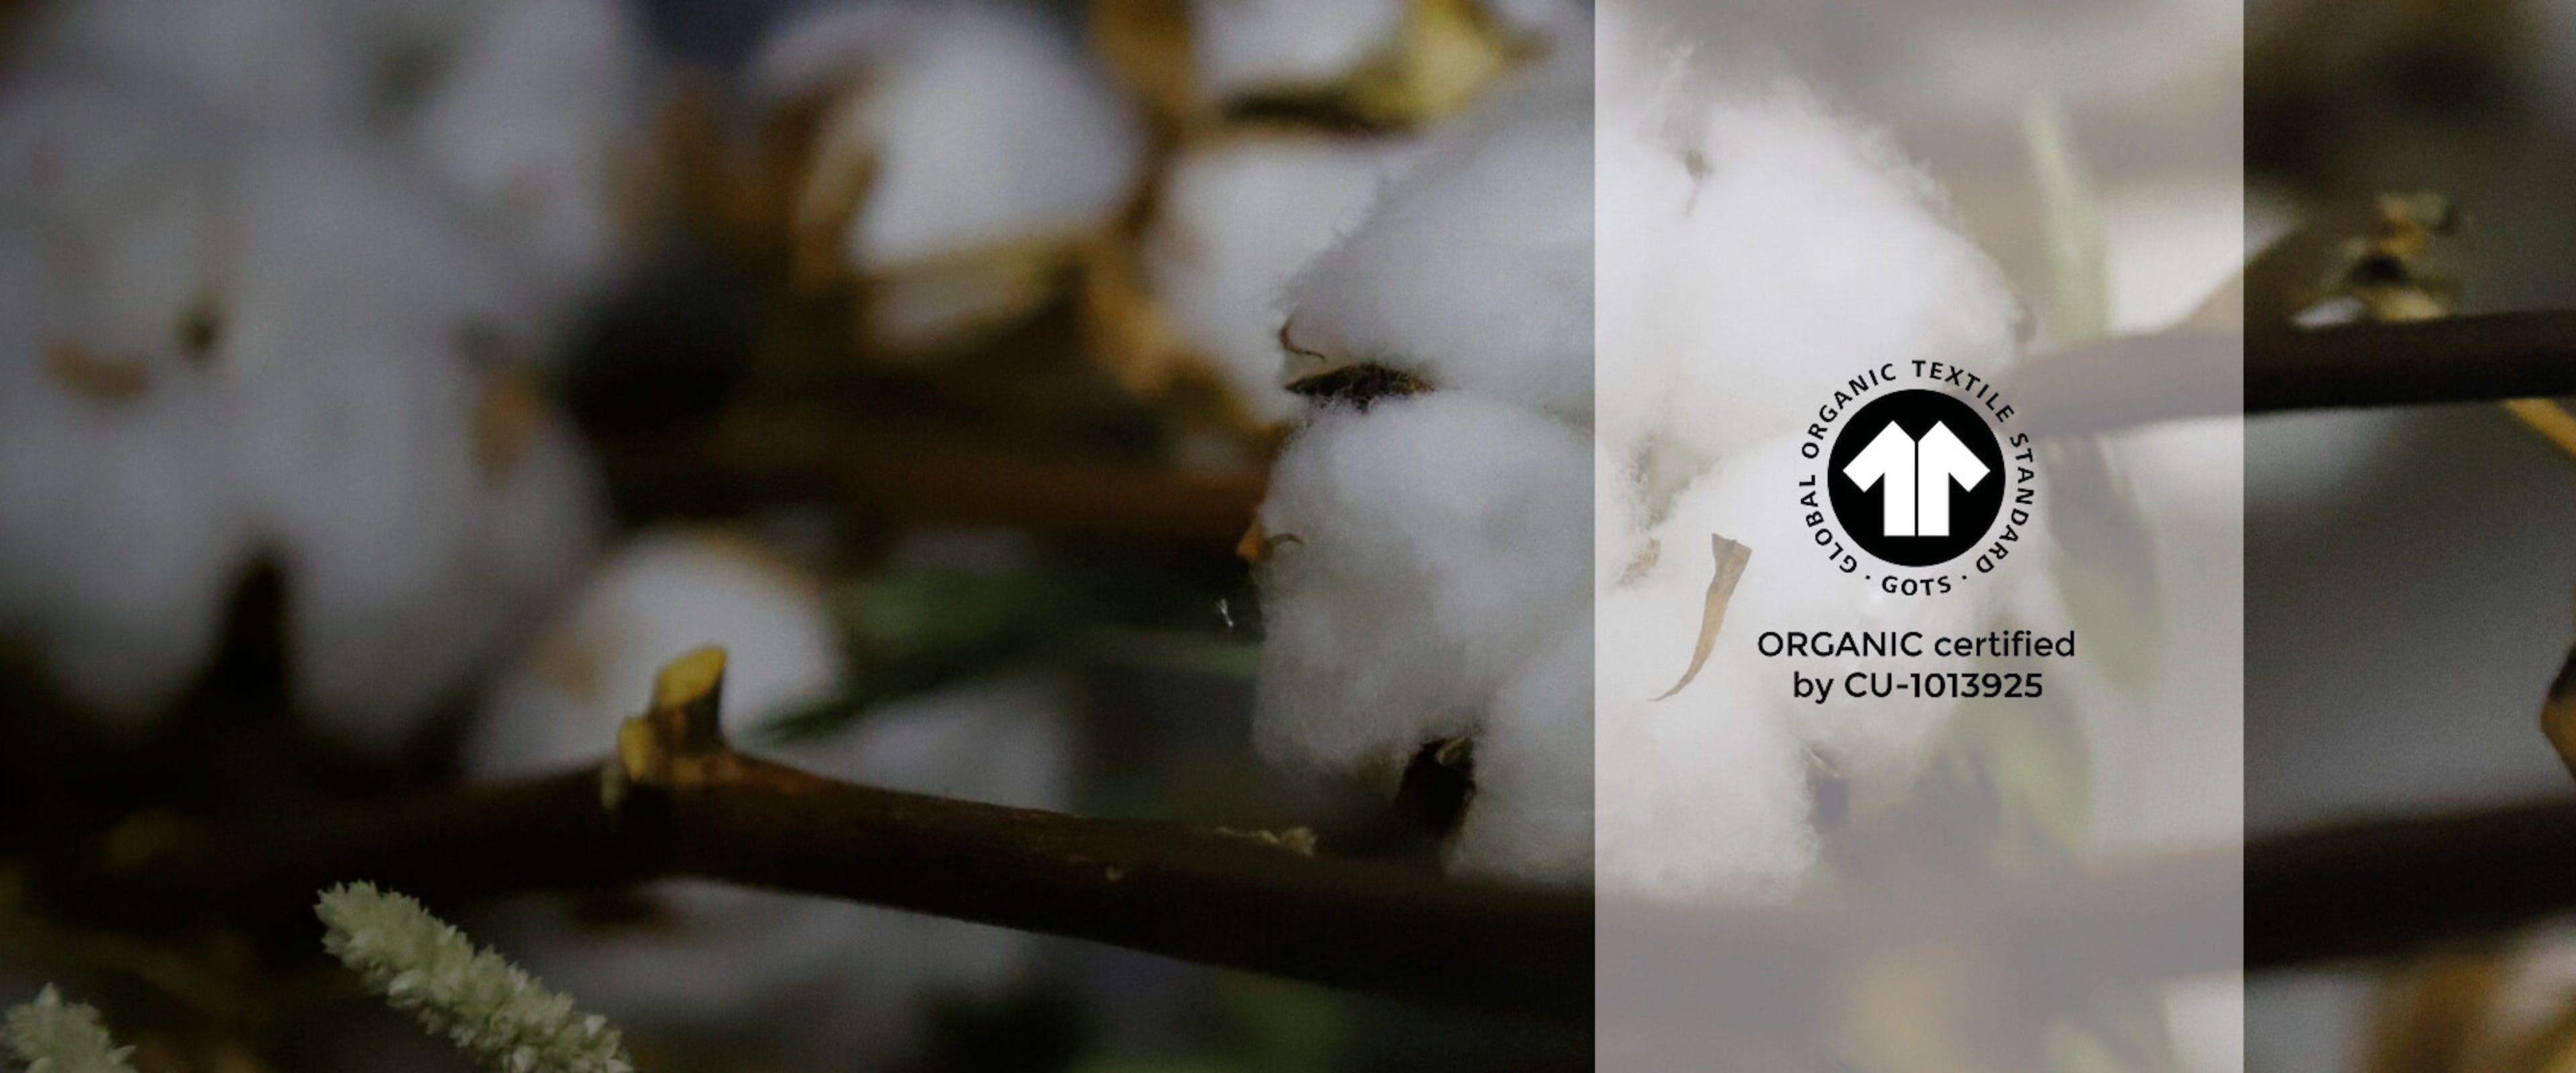 GOTS-zertifiziert Bio-Baumwolle